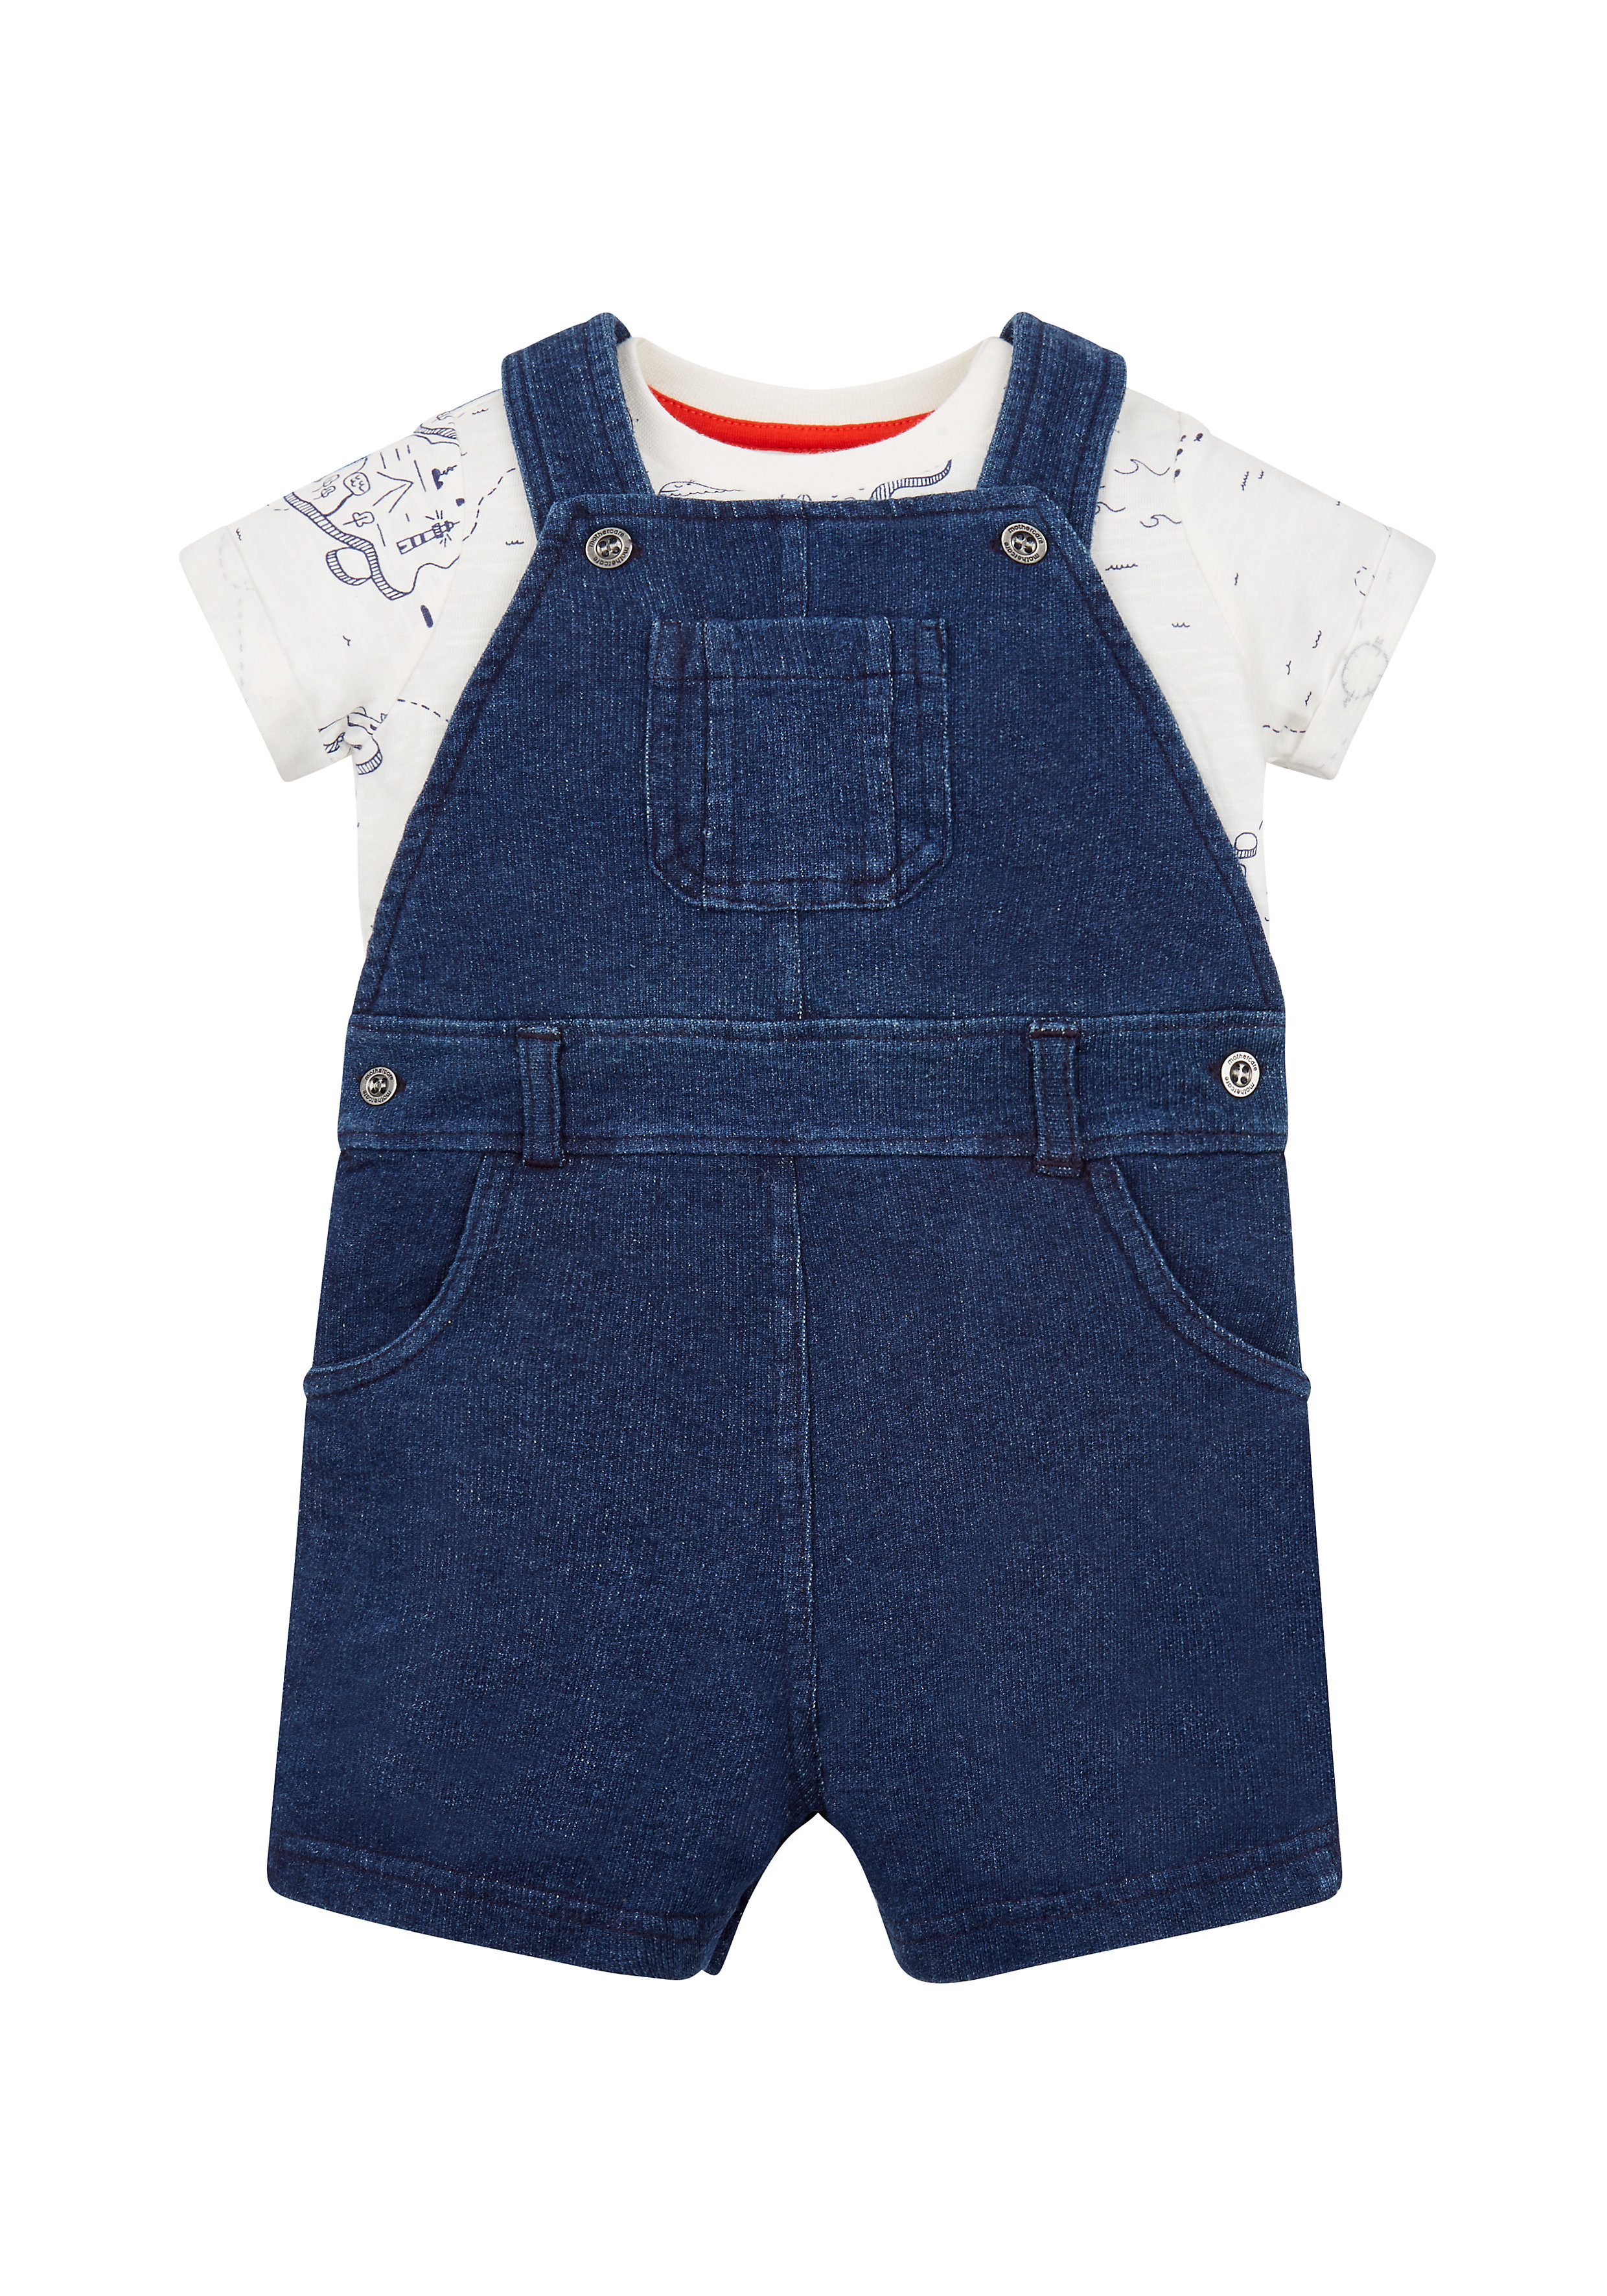 Mothercare | Boys Half Sleeves Dungaree Set Printed - Blue